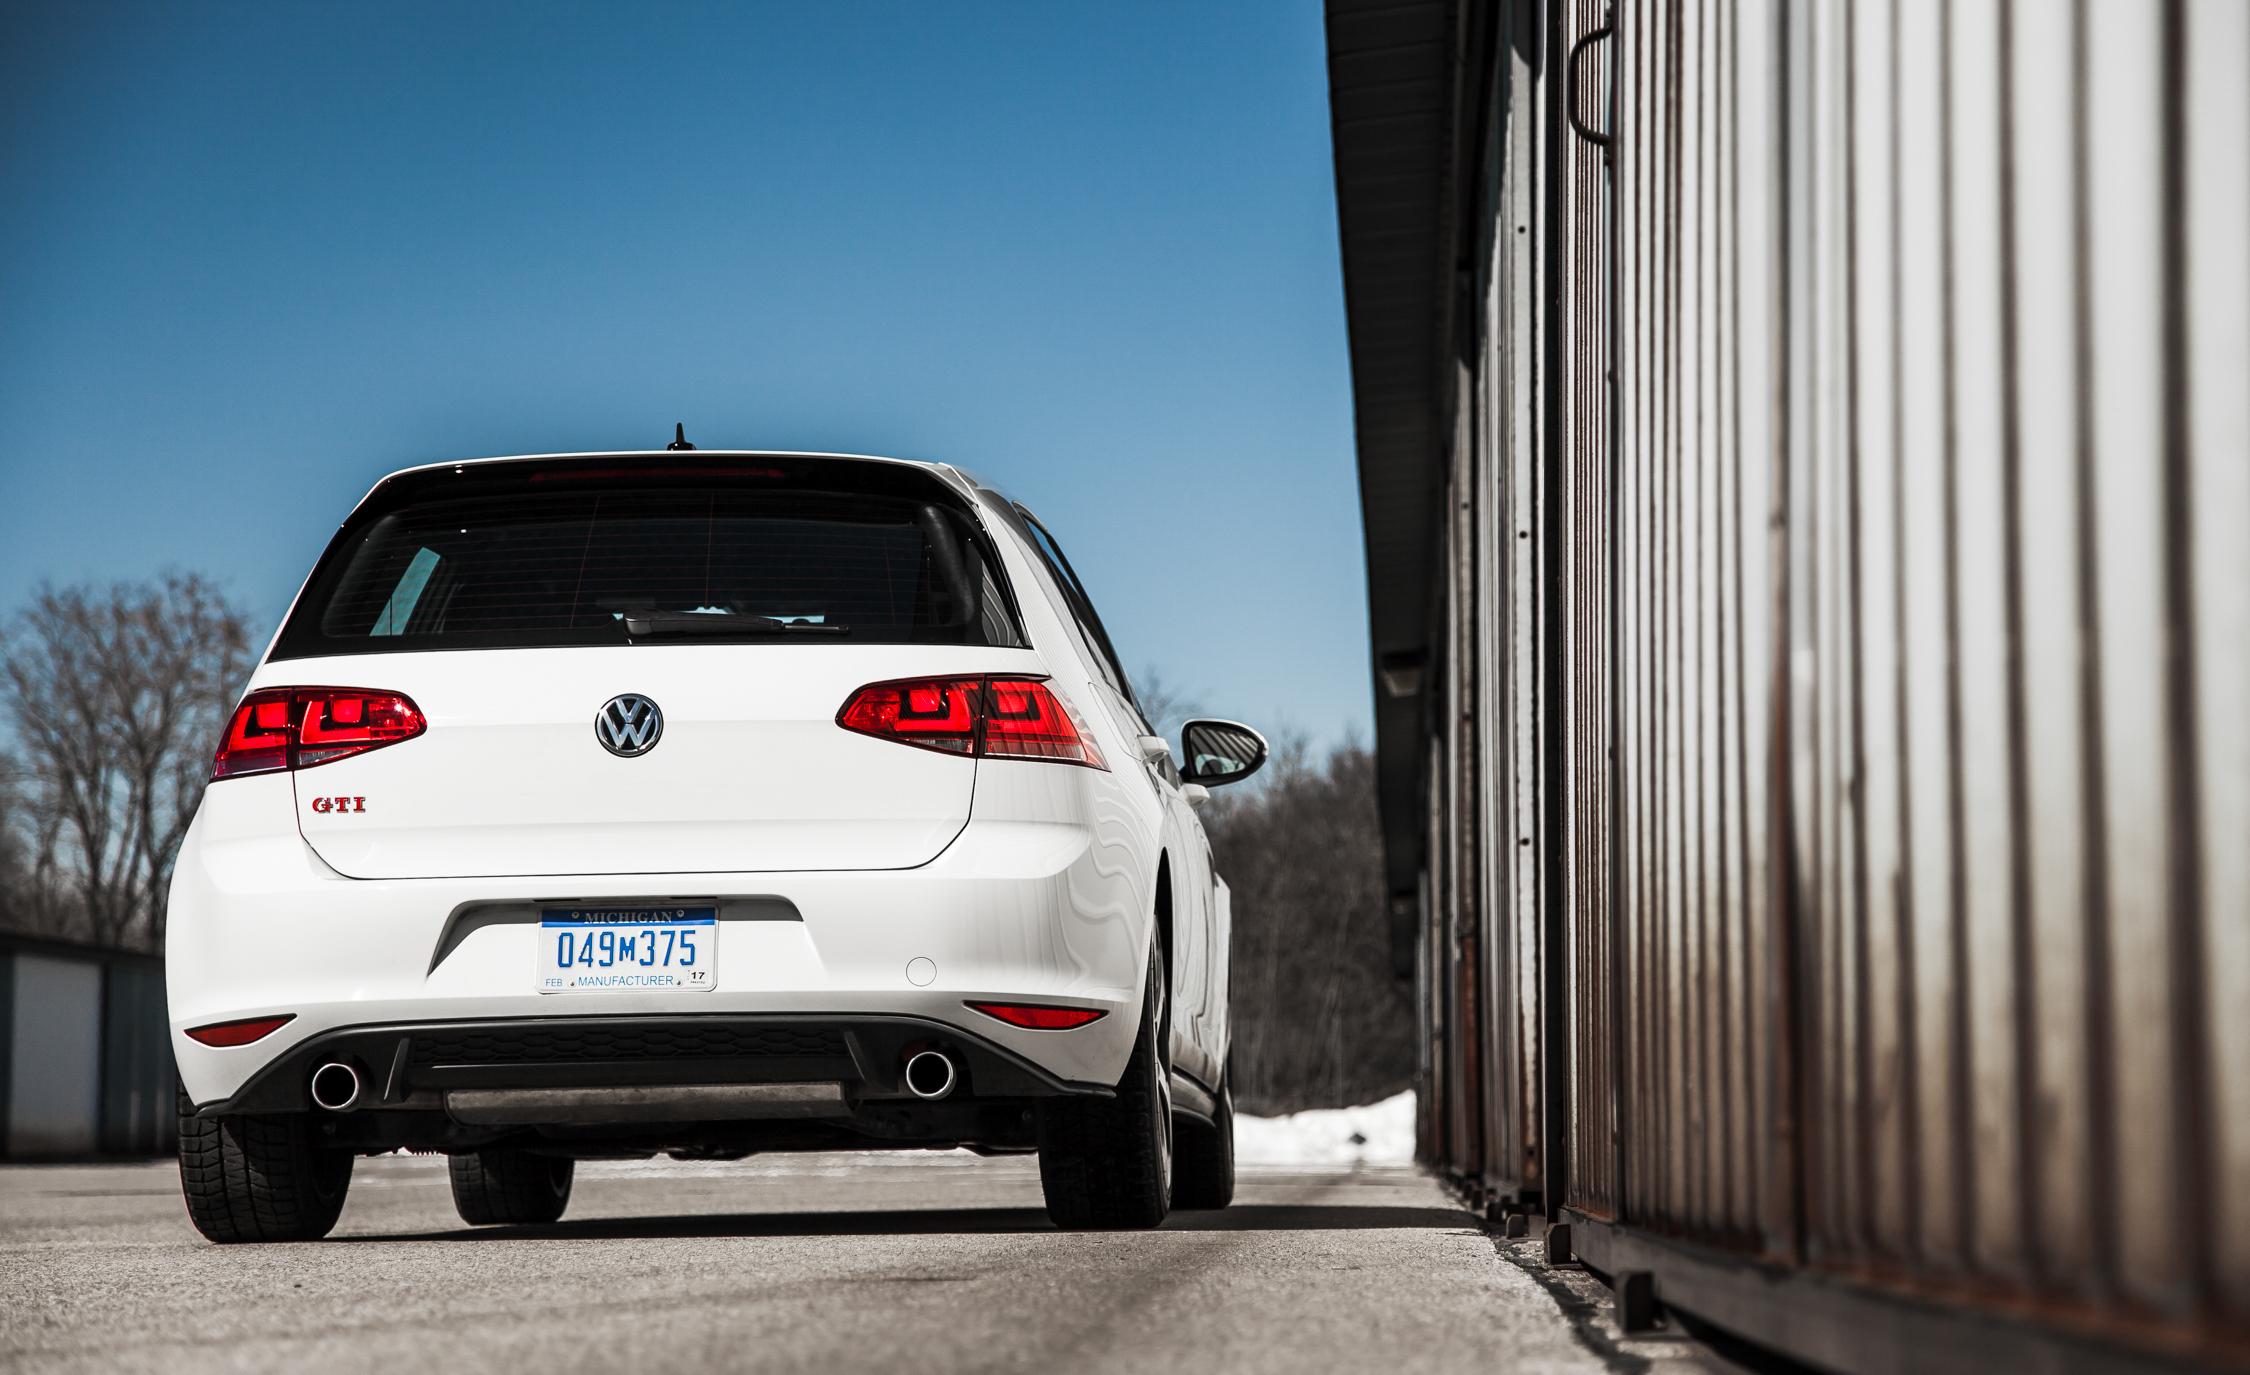 2015 Volkswagen GTI Exterior Rear